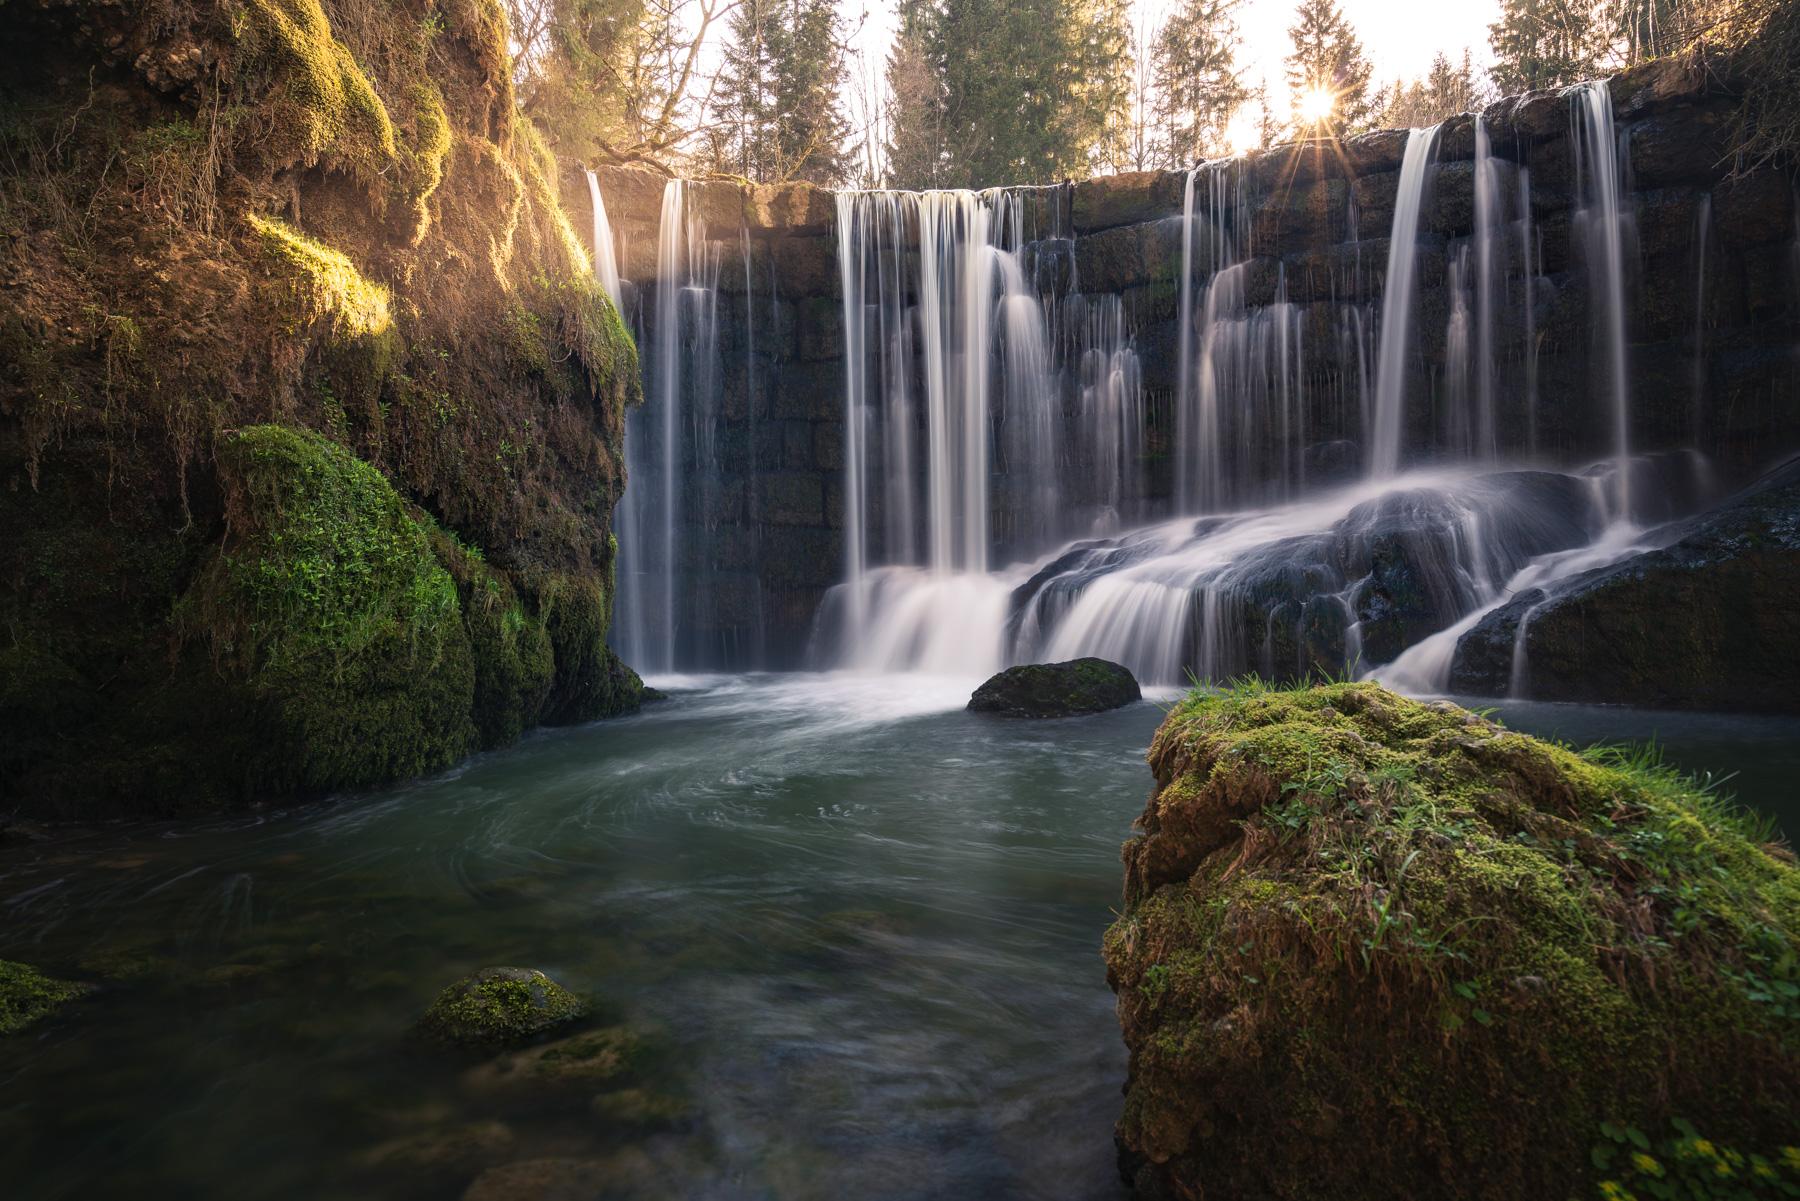 Geratser Wasserfälle im Allgäu